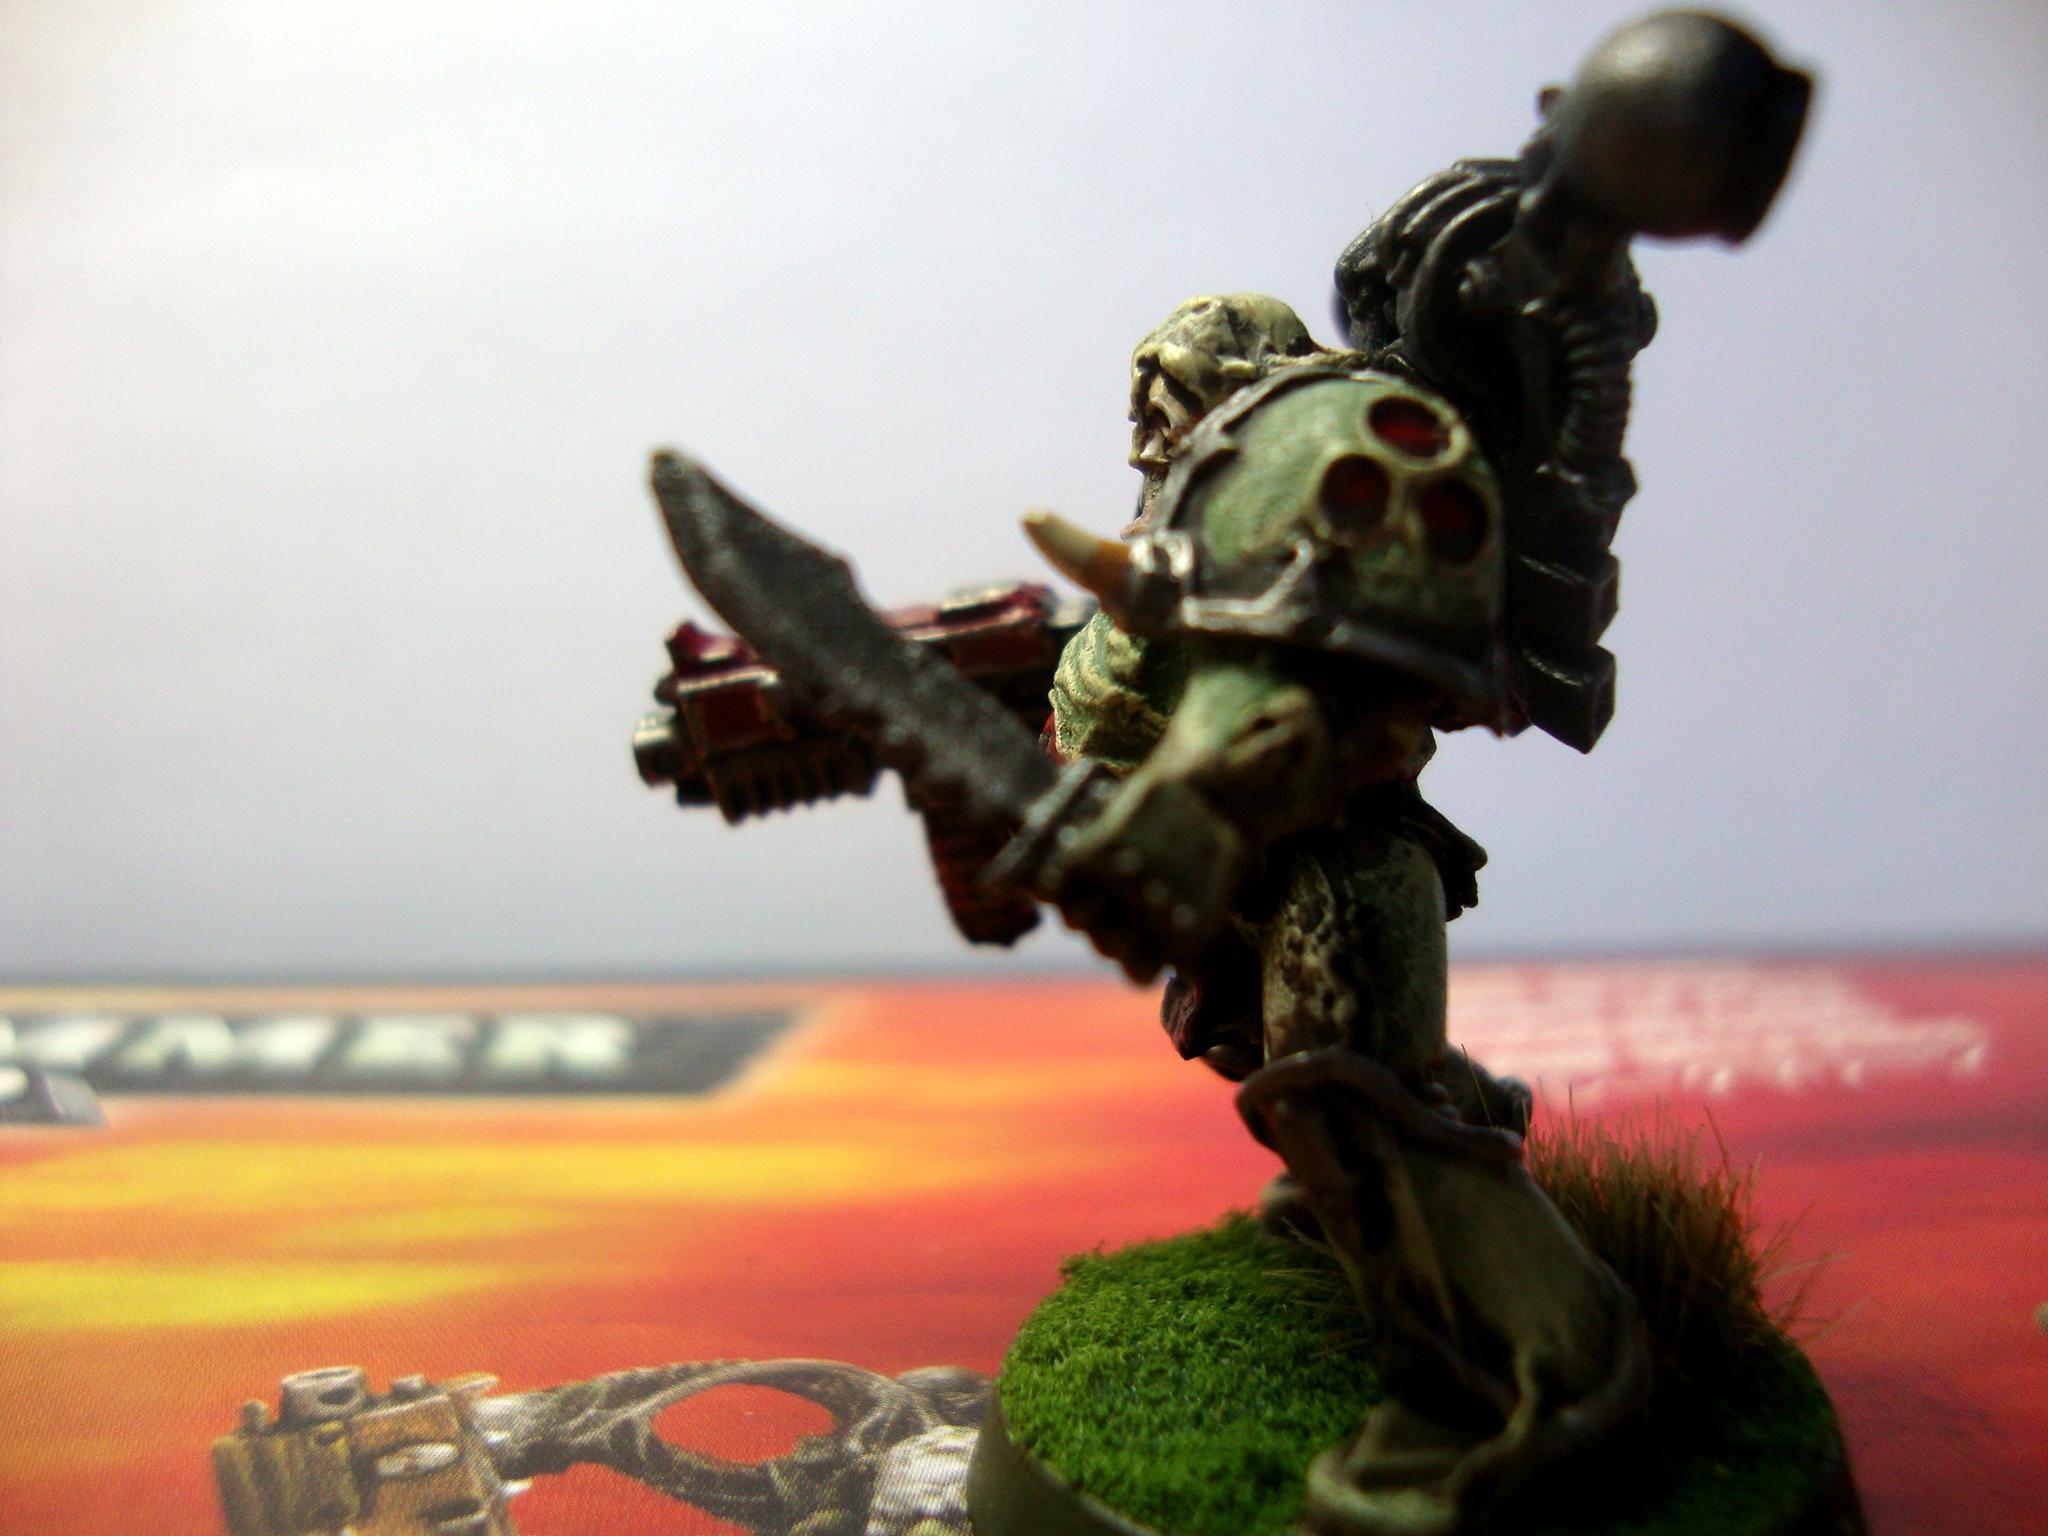 Bolter, Champion, Chaos, Death Guard, Destroyer Plague, Disease, Gore, Mortarion, Mutation, Nurgle, Plague, Plague Marines, Space Marines, Typhus, Warhammer 40,000